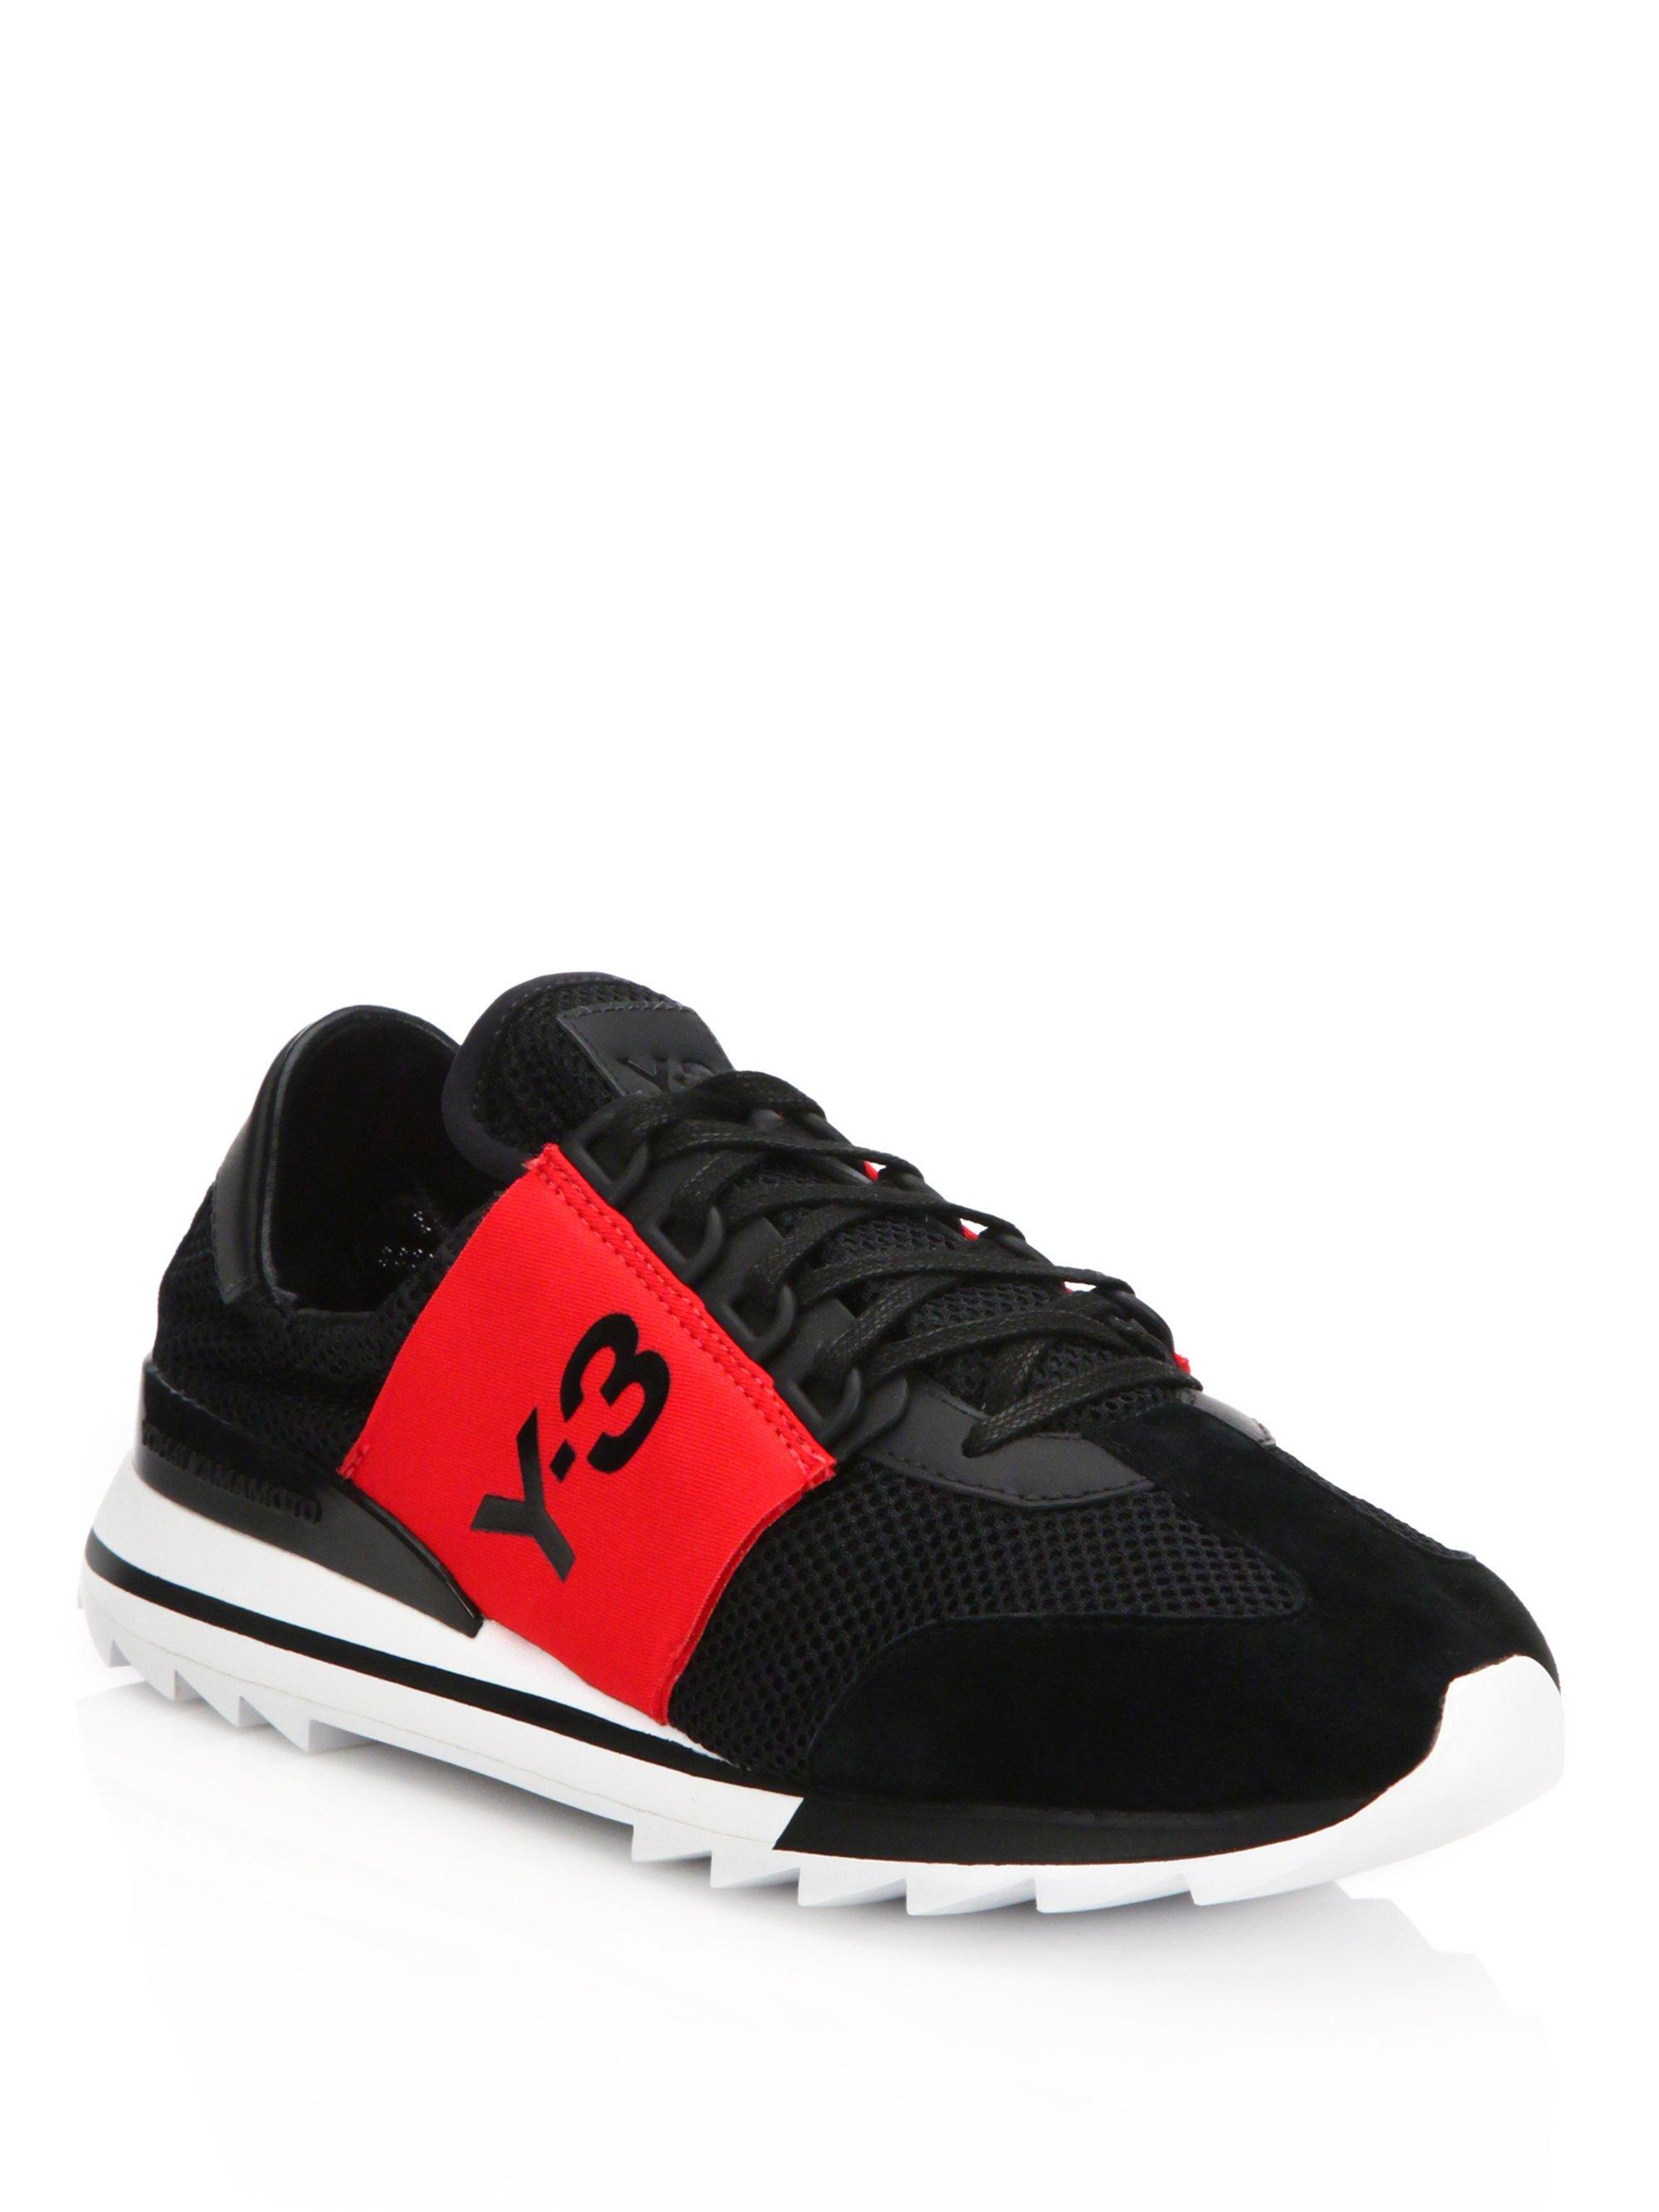 lyst y3 rhita sport sneakers in red